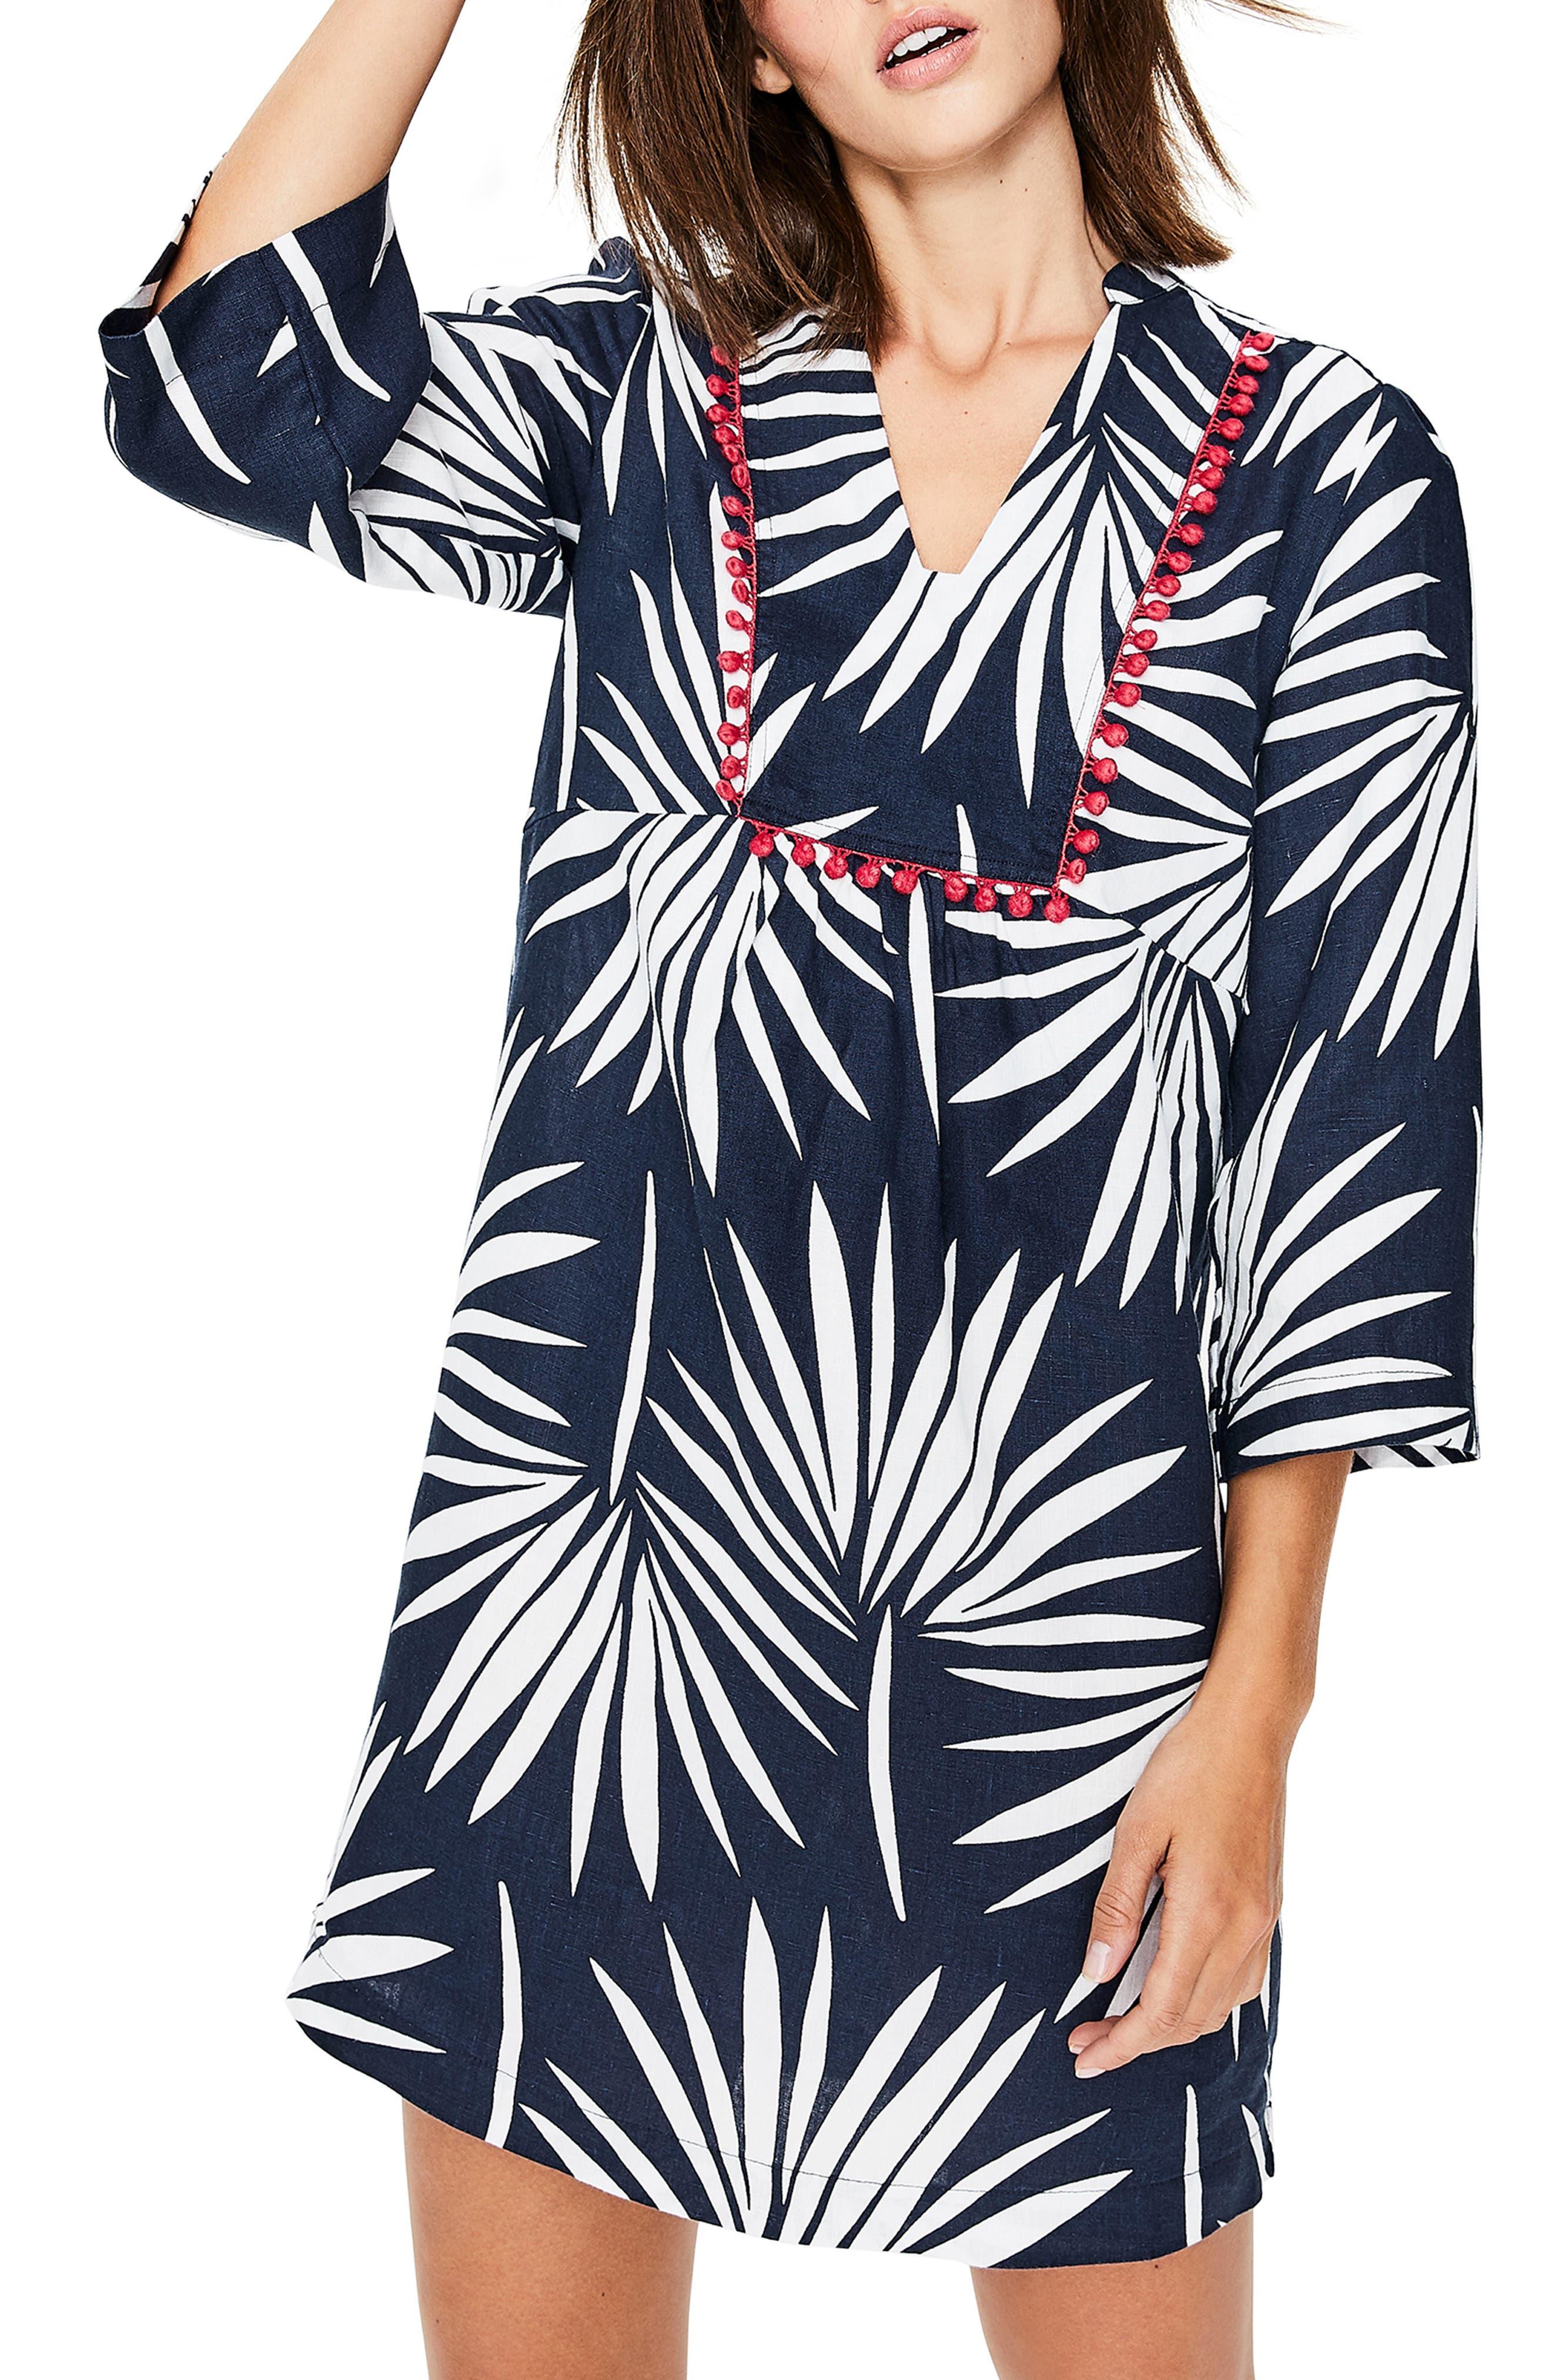 Boden Evangeline Print Linen Dress, Blue